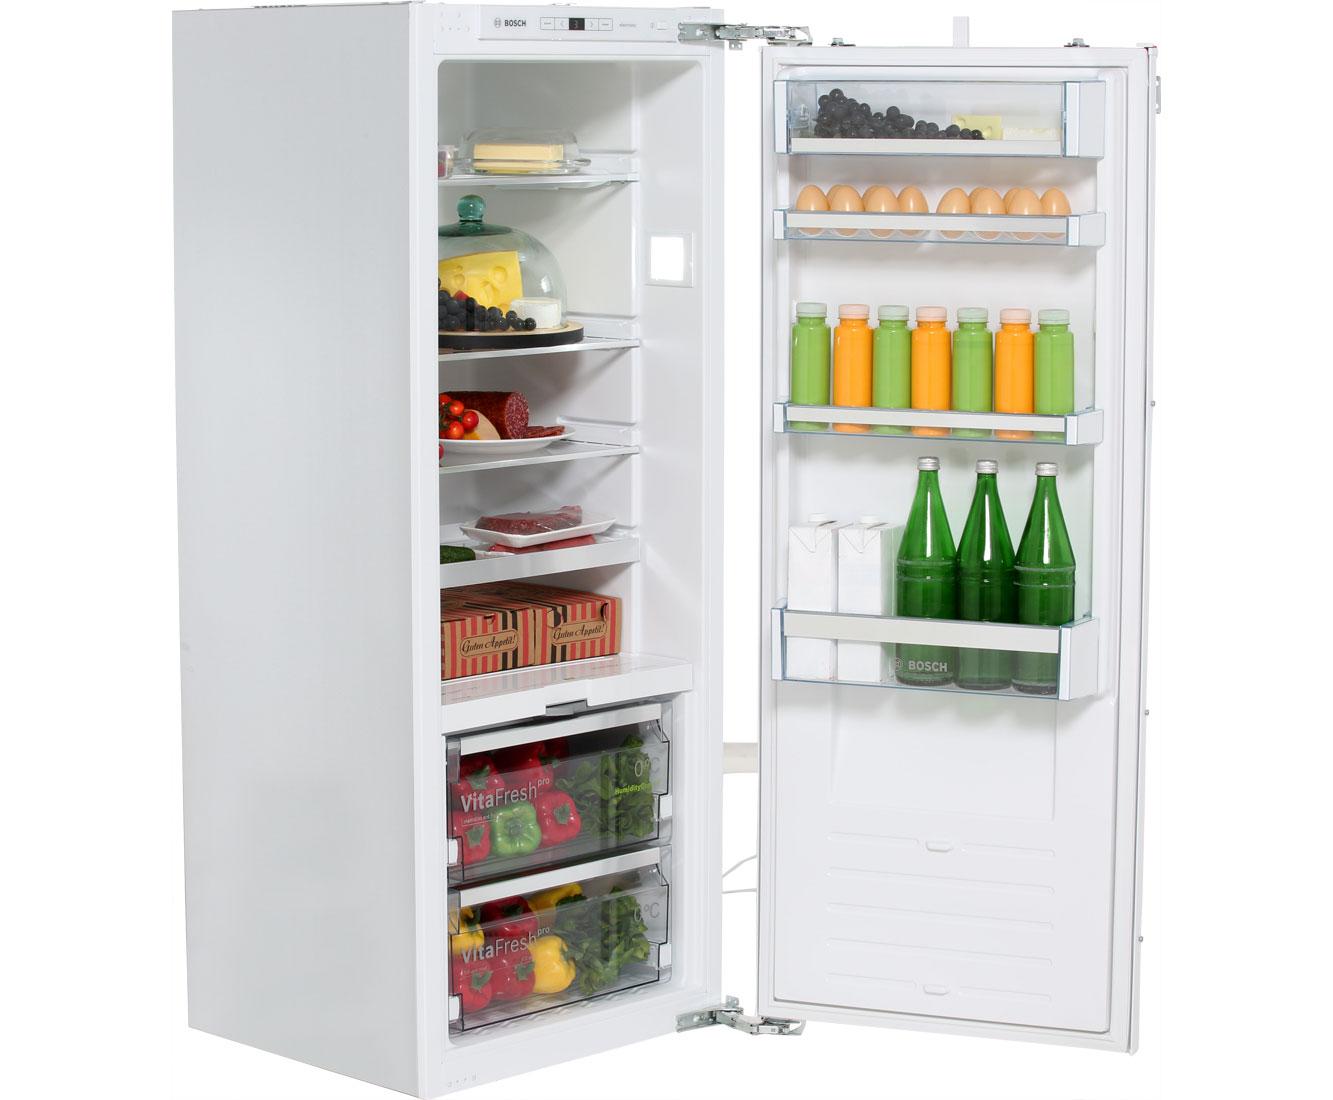 Bosch Kühlschrank Preise : Bosch kühlschrank preise bosch kühlschrank kgn vl in baden